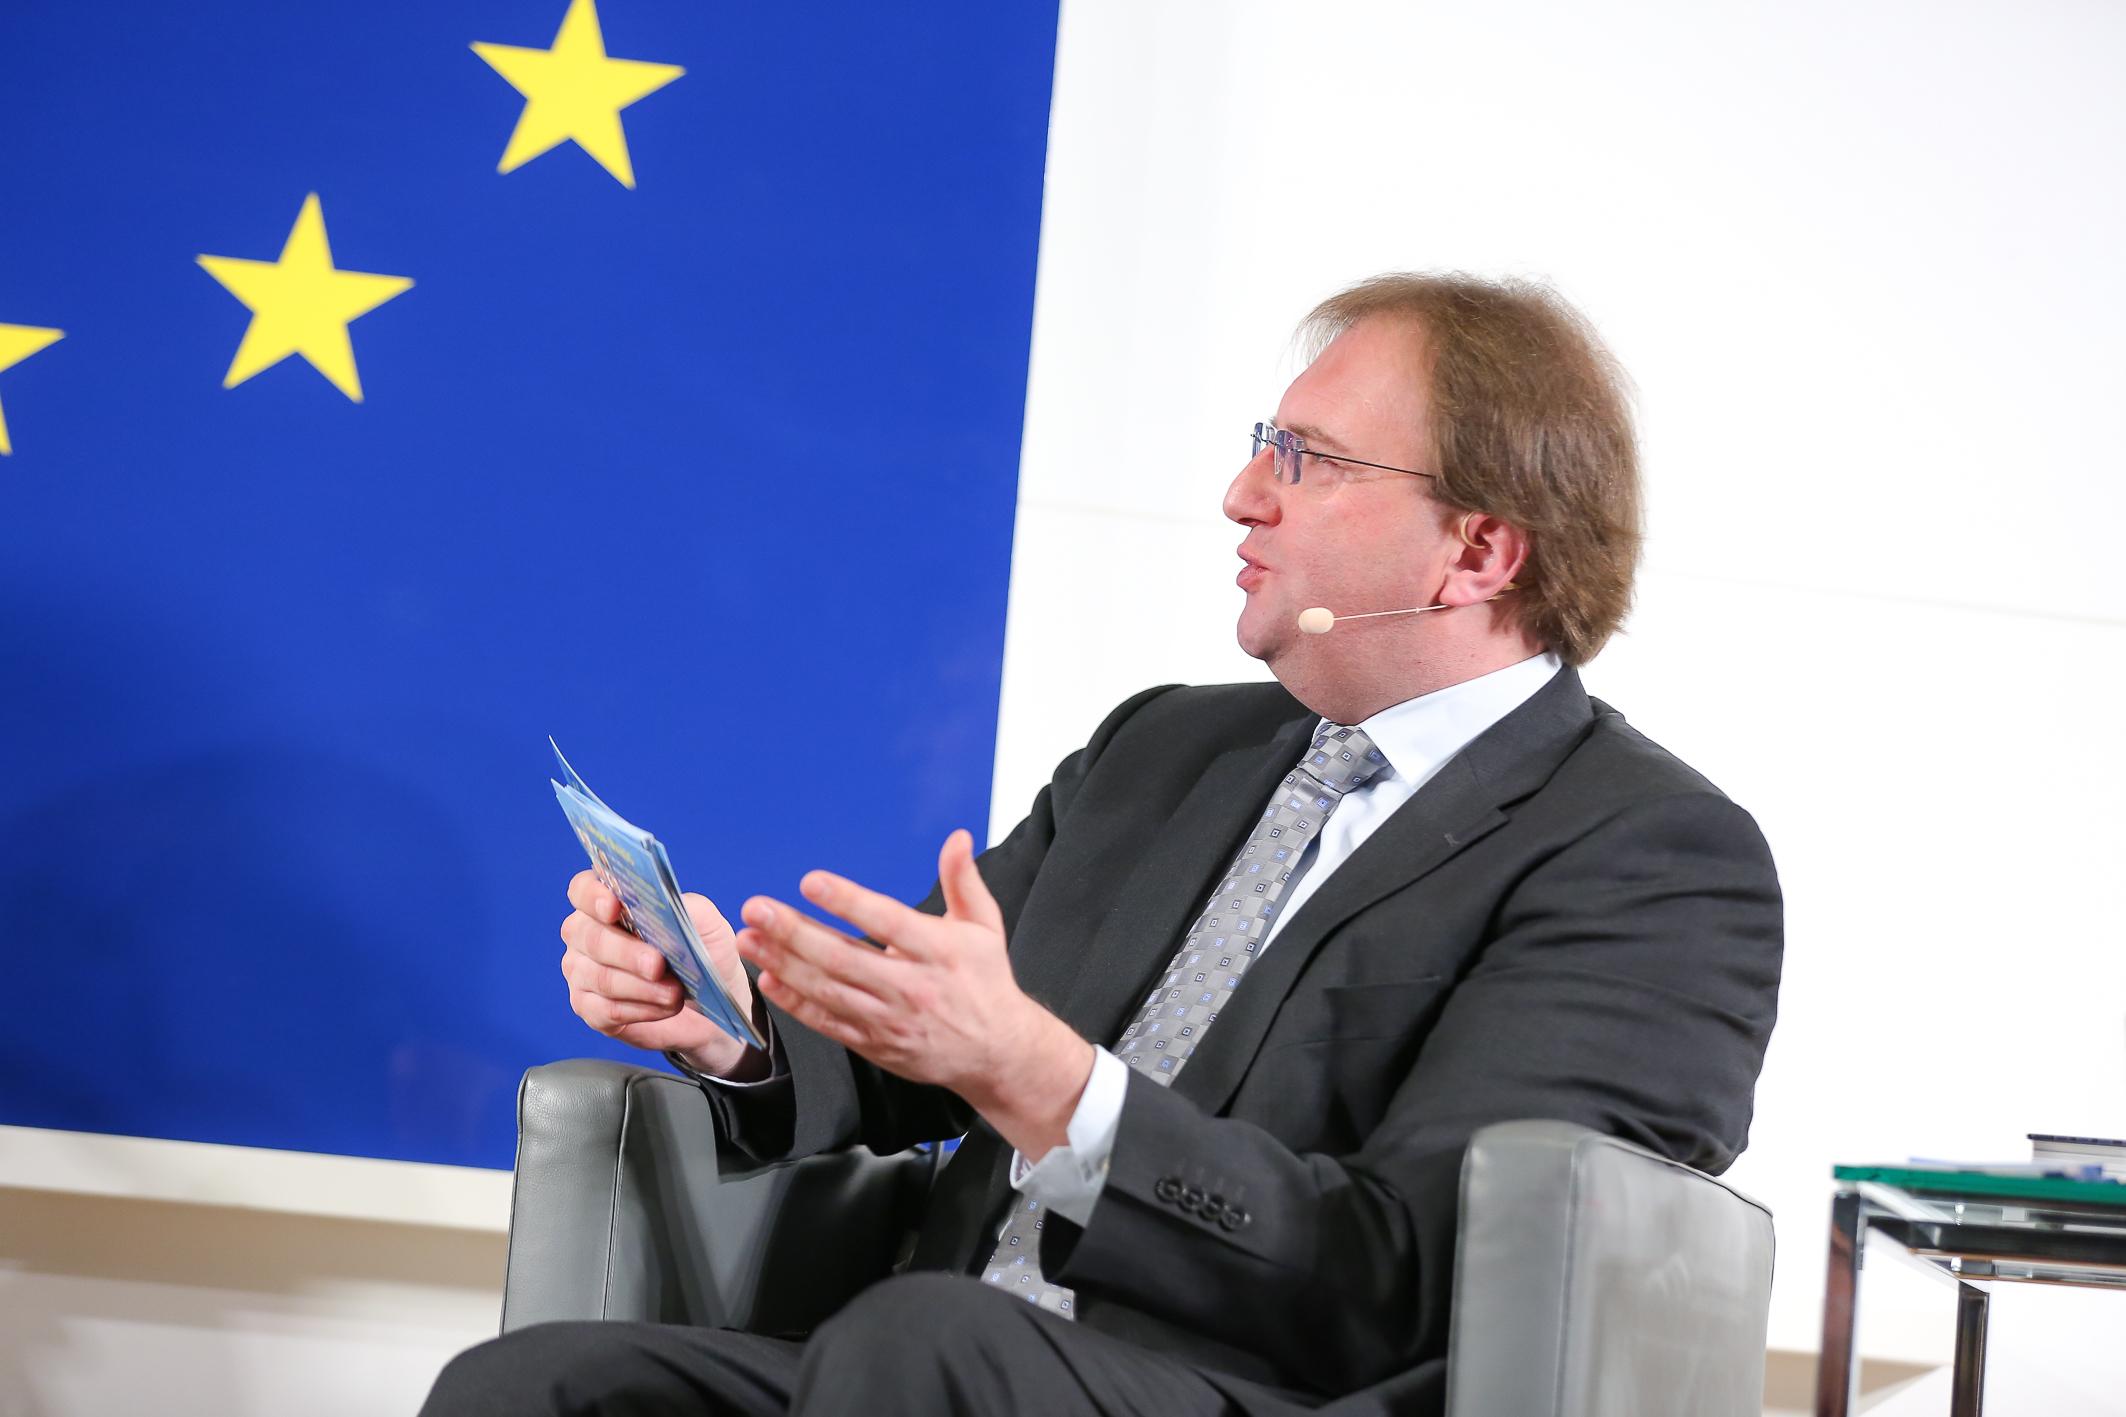 europadialog_ernst-gelegs_a08_0918__credit_moni-fellner